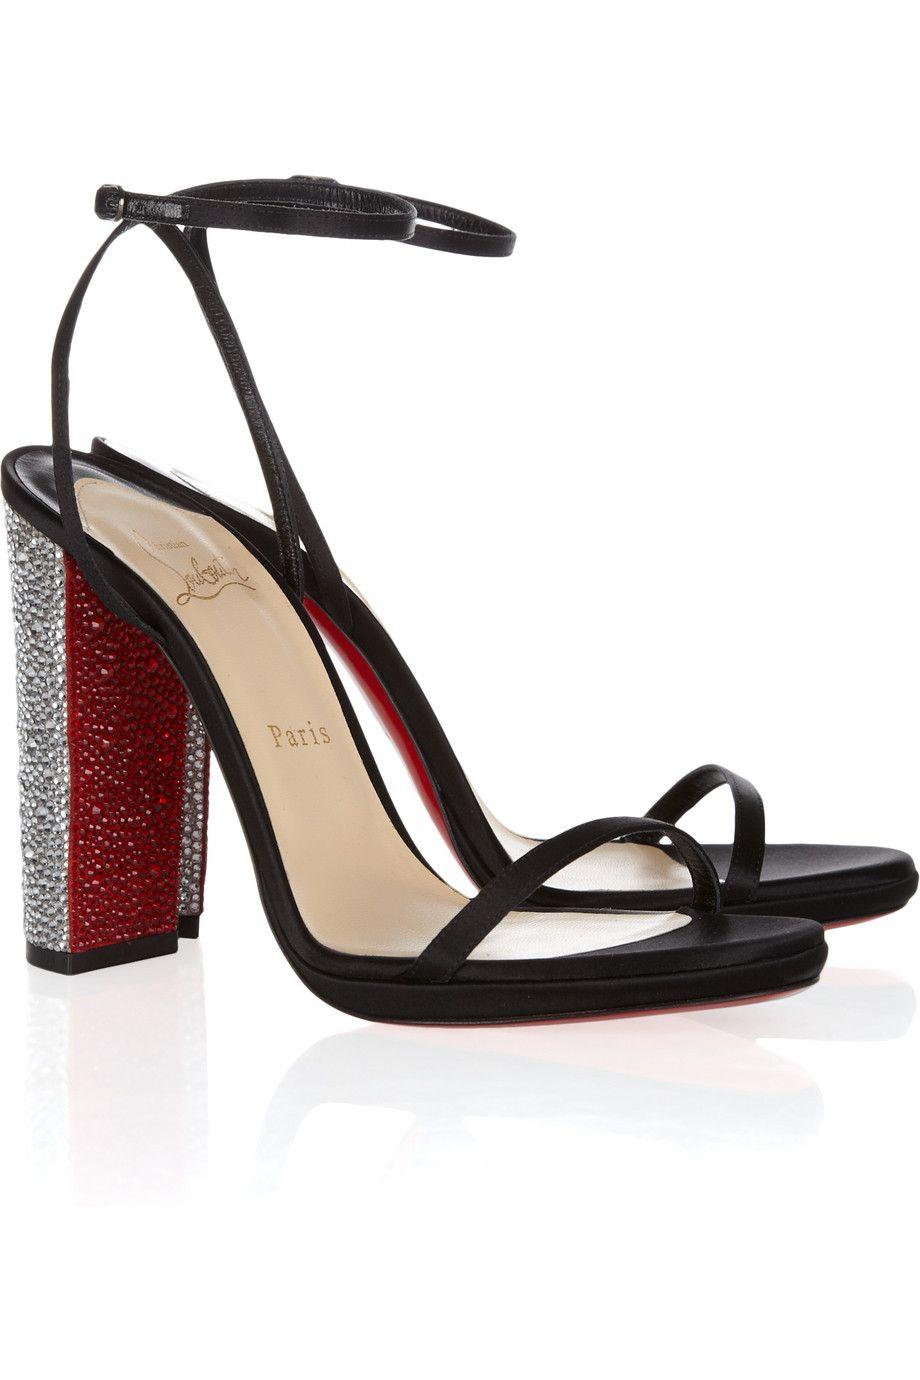 331a138bb6e Christian Louboutin | Au Palace 120 crystal-heel satin sandals | NET ...